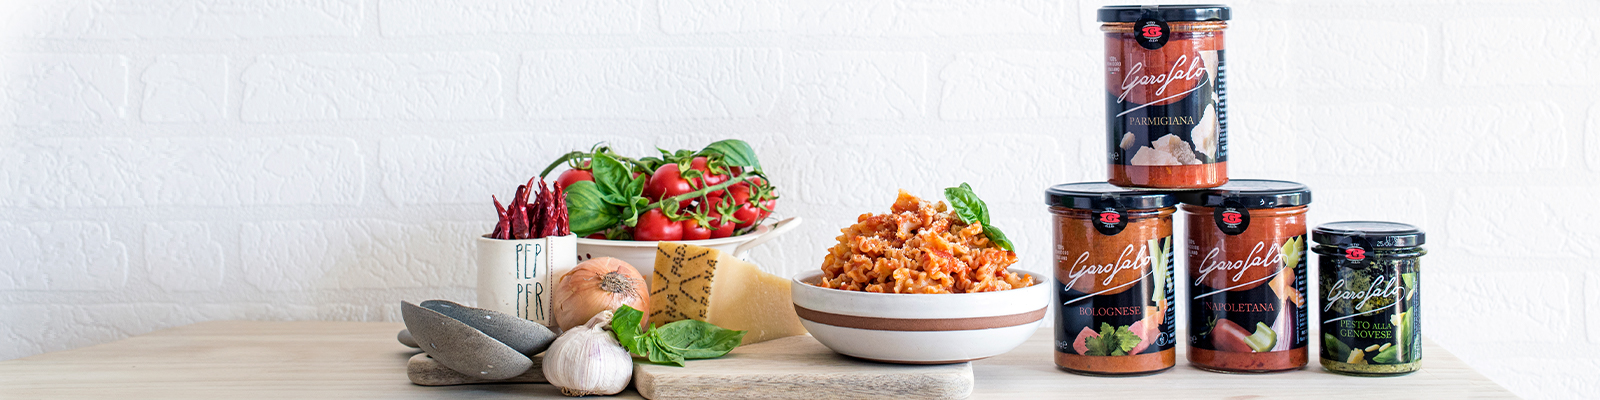 Pasta Garofalo - Molhos 180 g